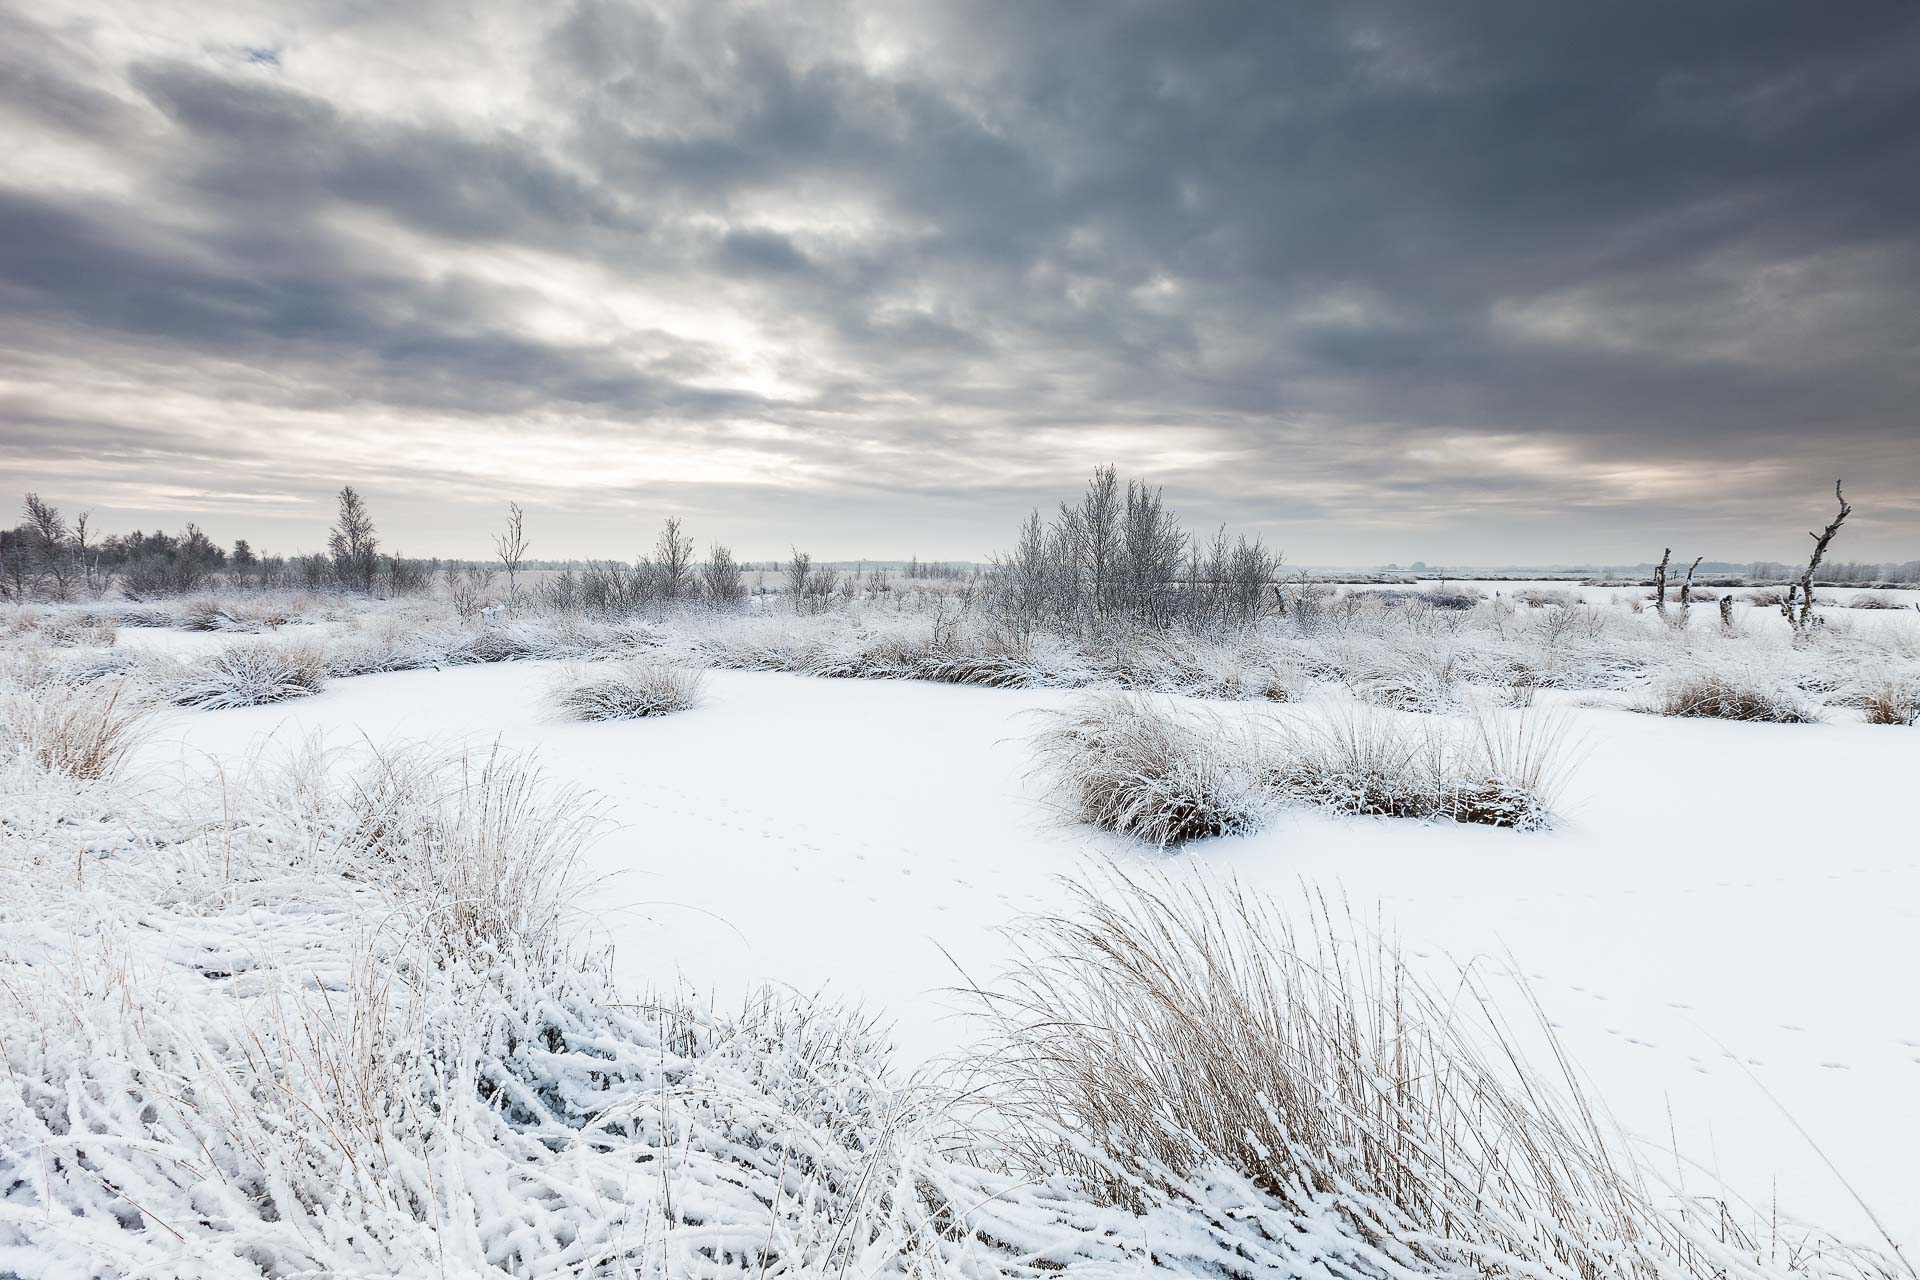 A beautiful winter day at the Fochteloërveen National Park, The Netherlands